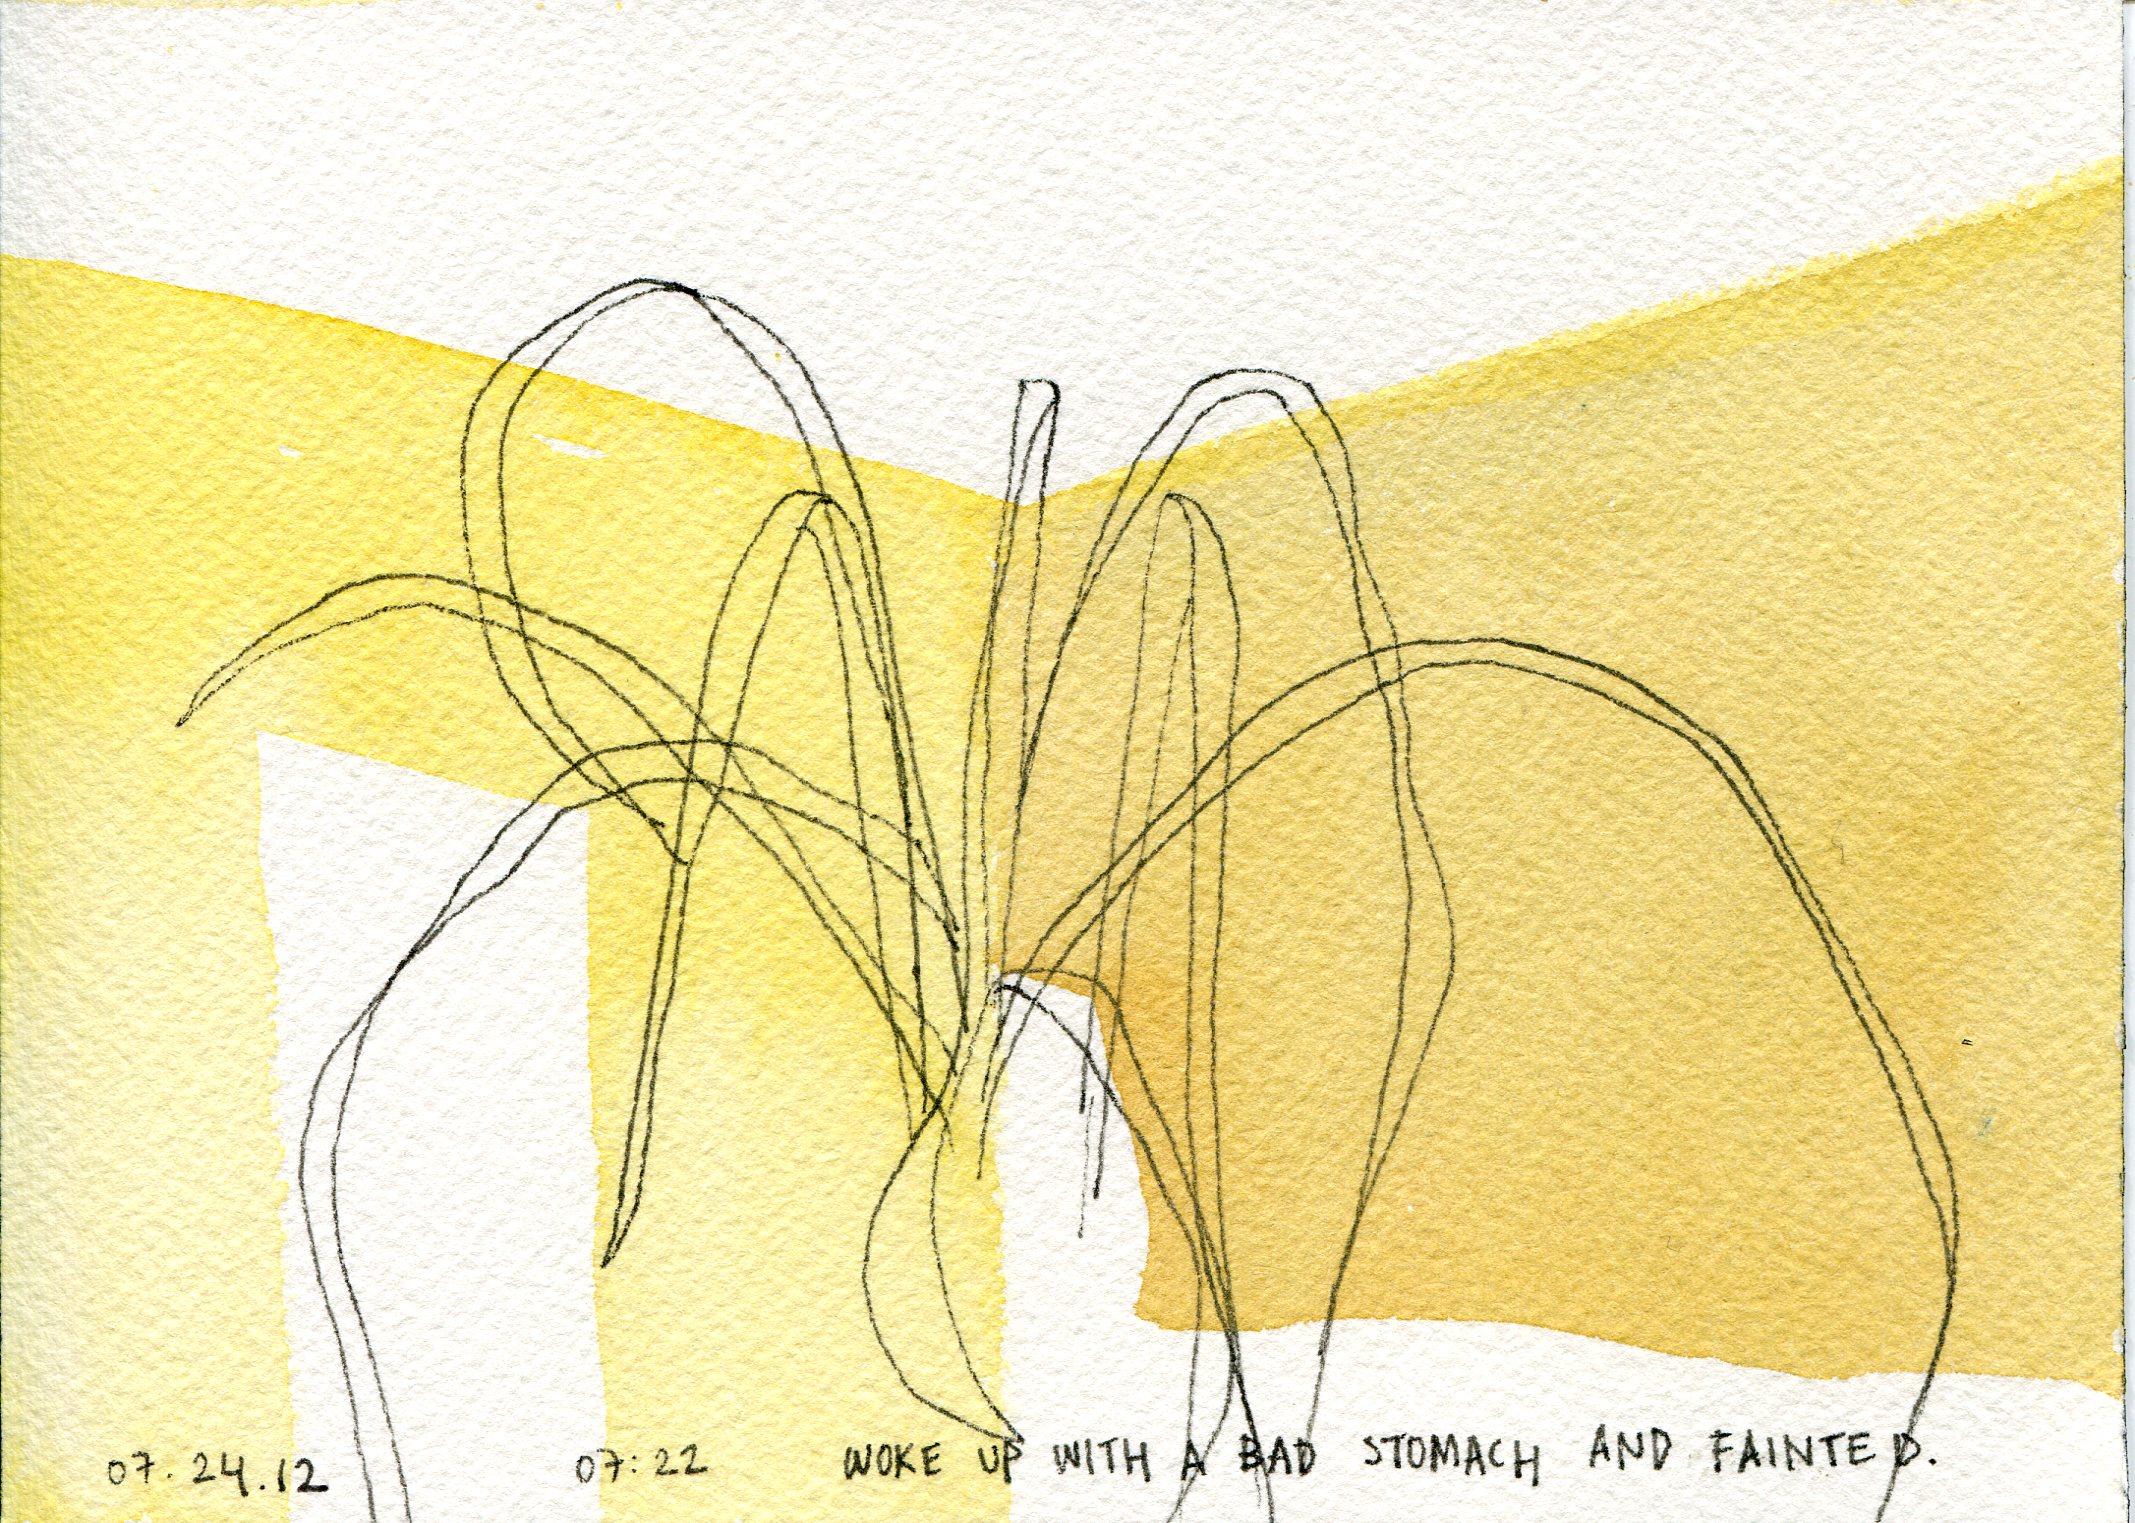 2012-07-29 drawing003.jpg